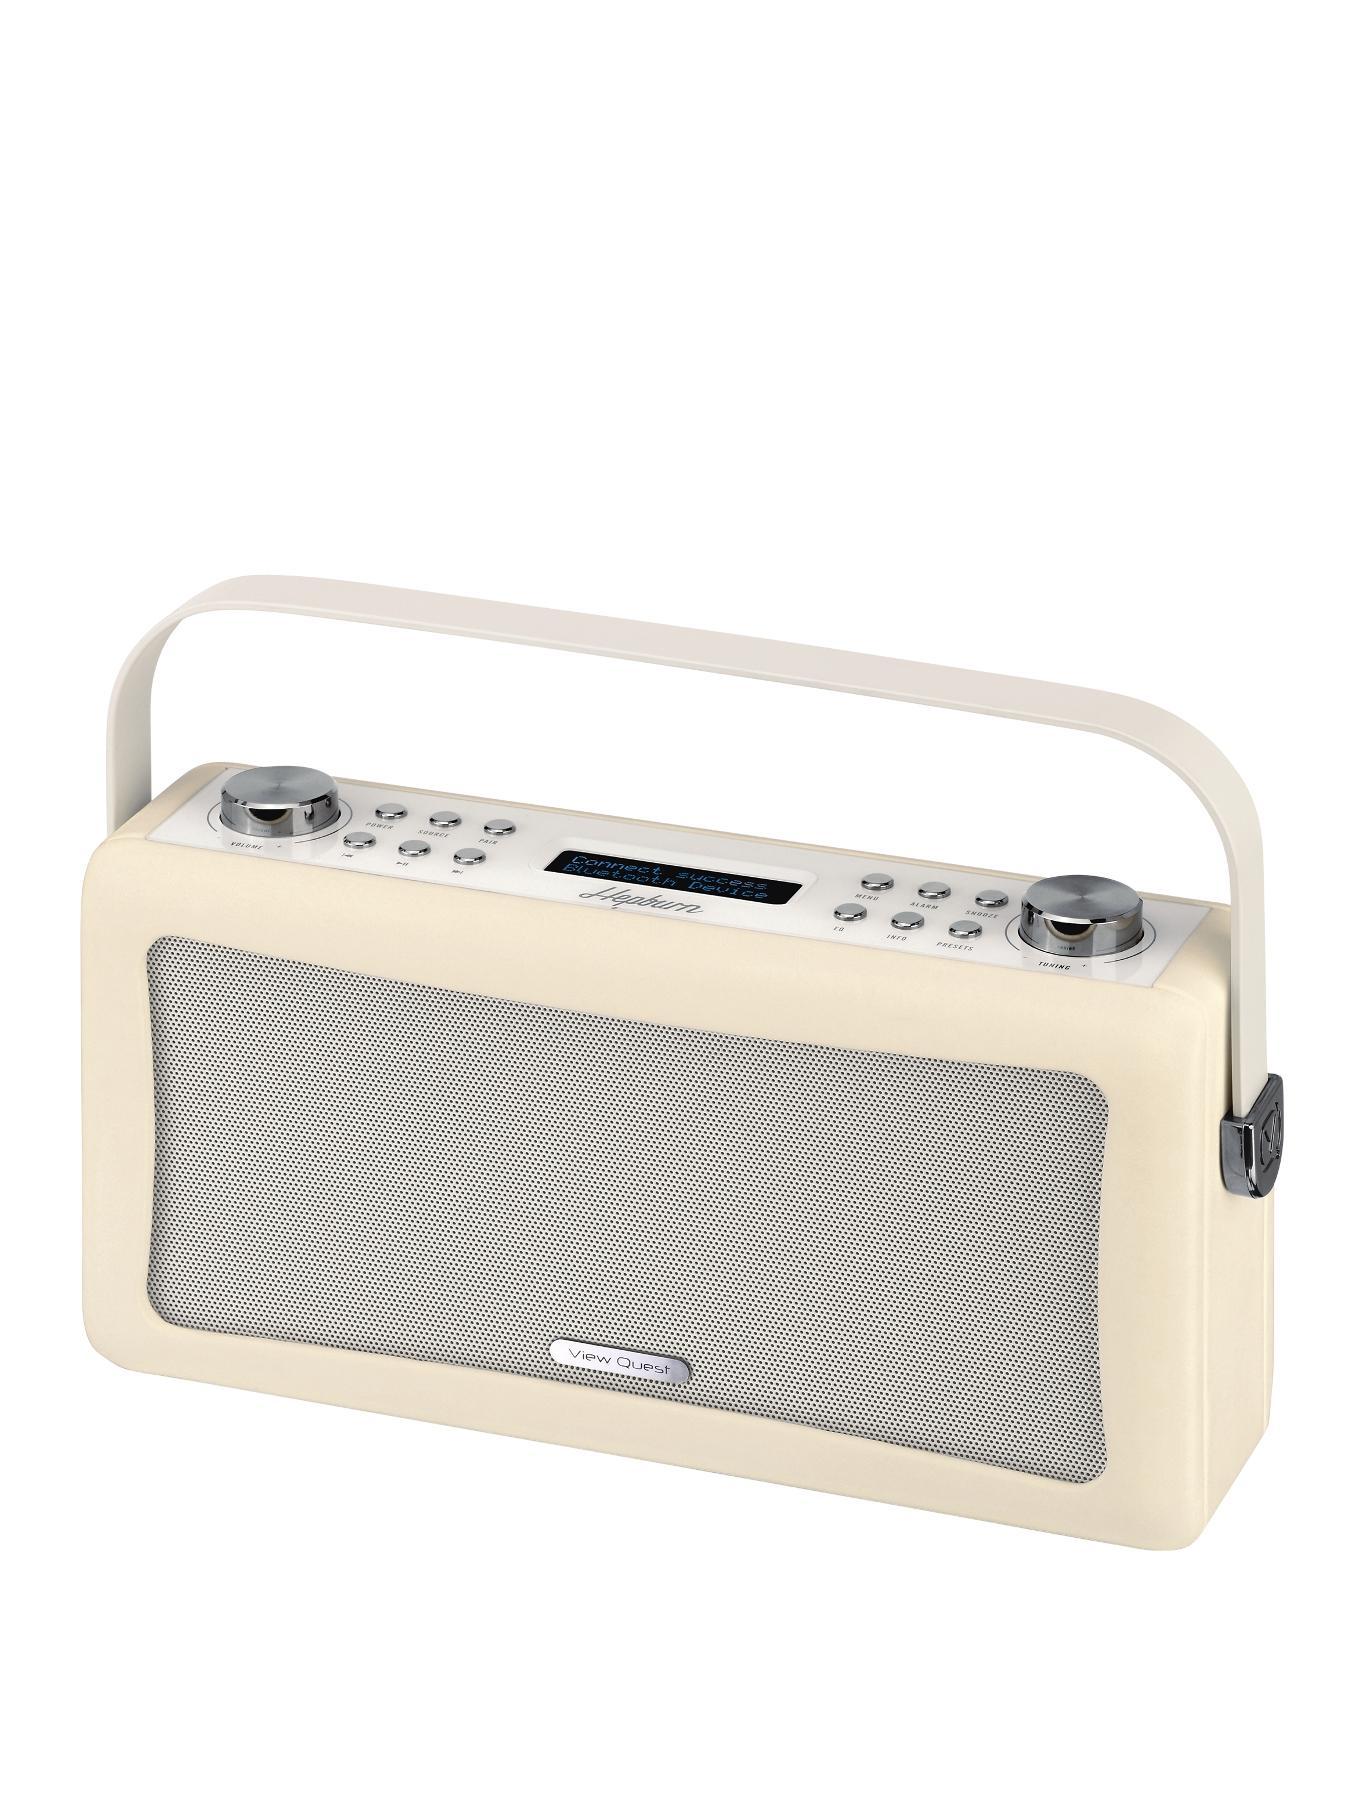 View Quest Hepburn Portable Bluetooth DAB Radio - Cream